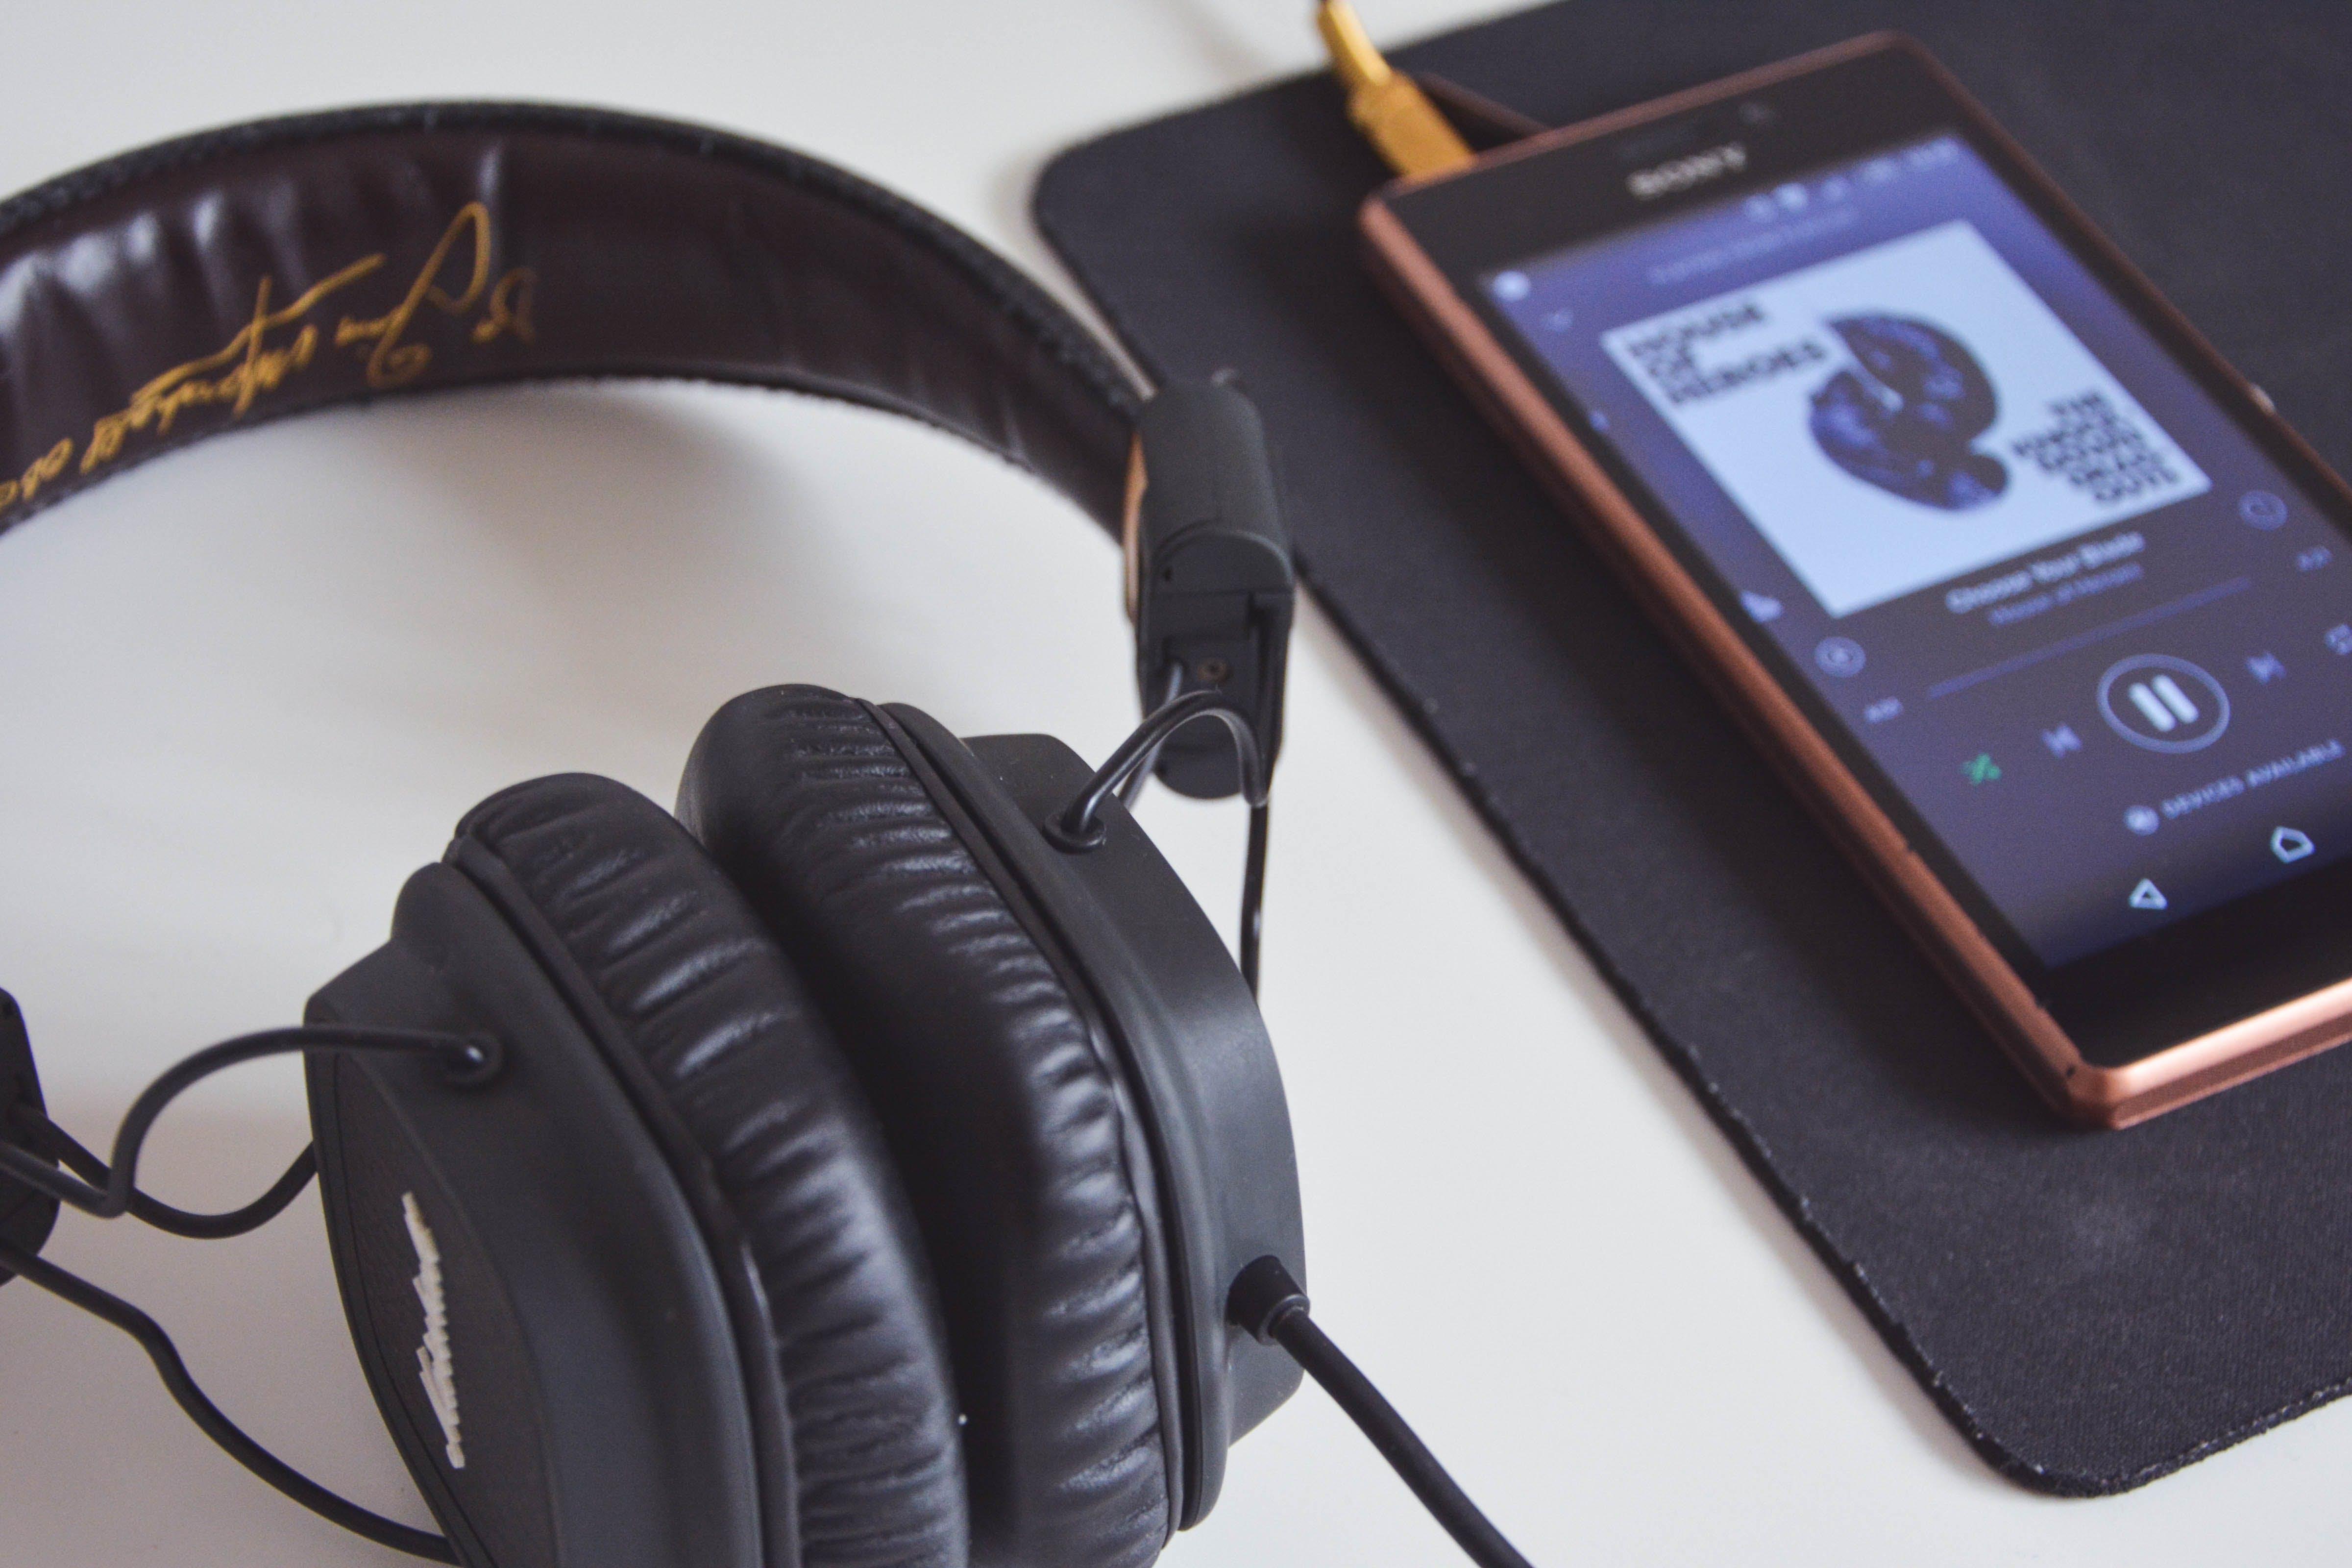 Black Corded Headphones Beside Sony Android Smartphone